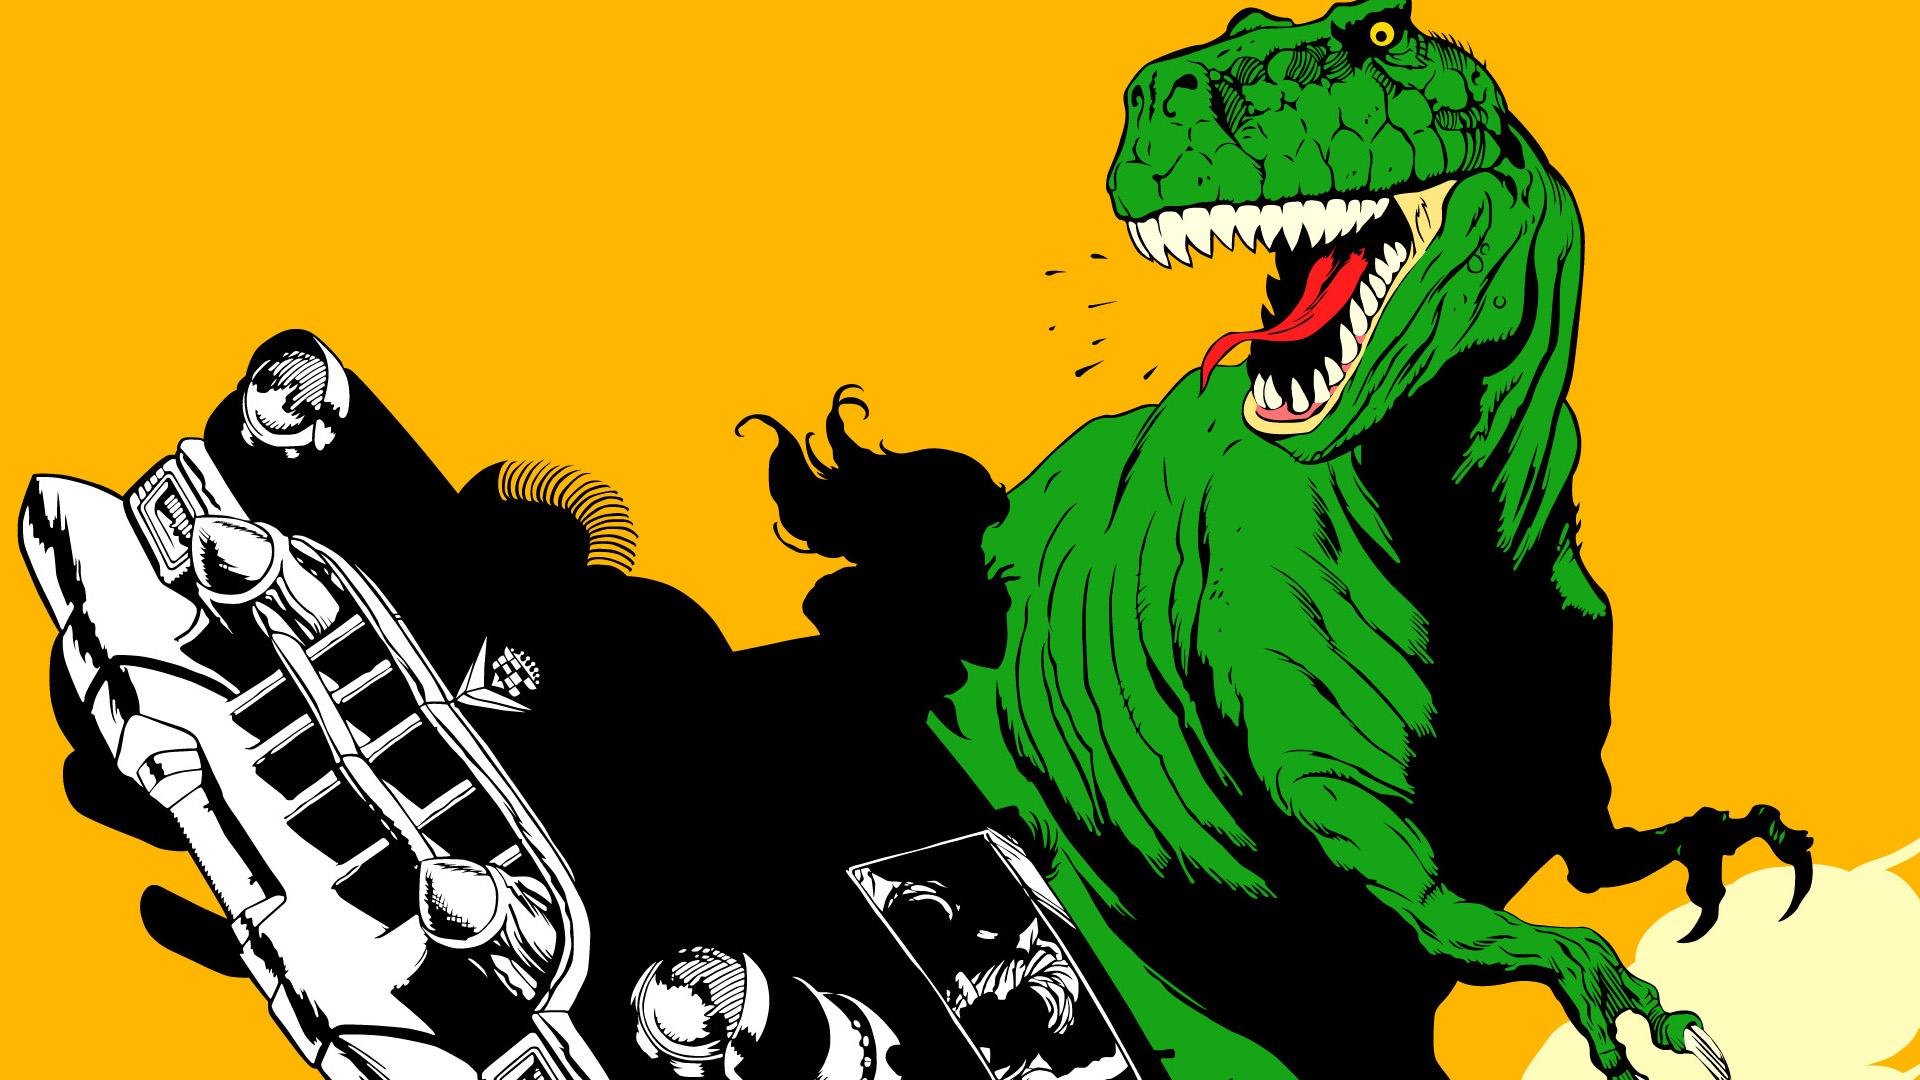 Free 3d Dinosaur Wallpaper Cadillacs And Dinosaurs Details Launchbox Games Database